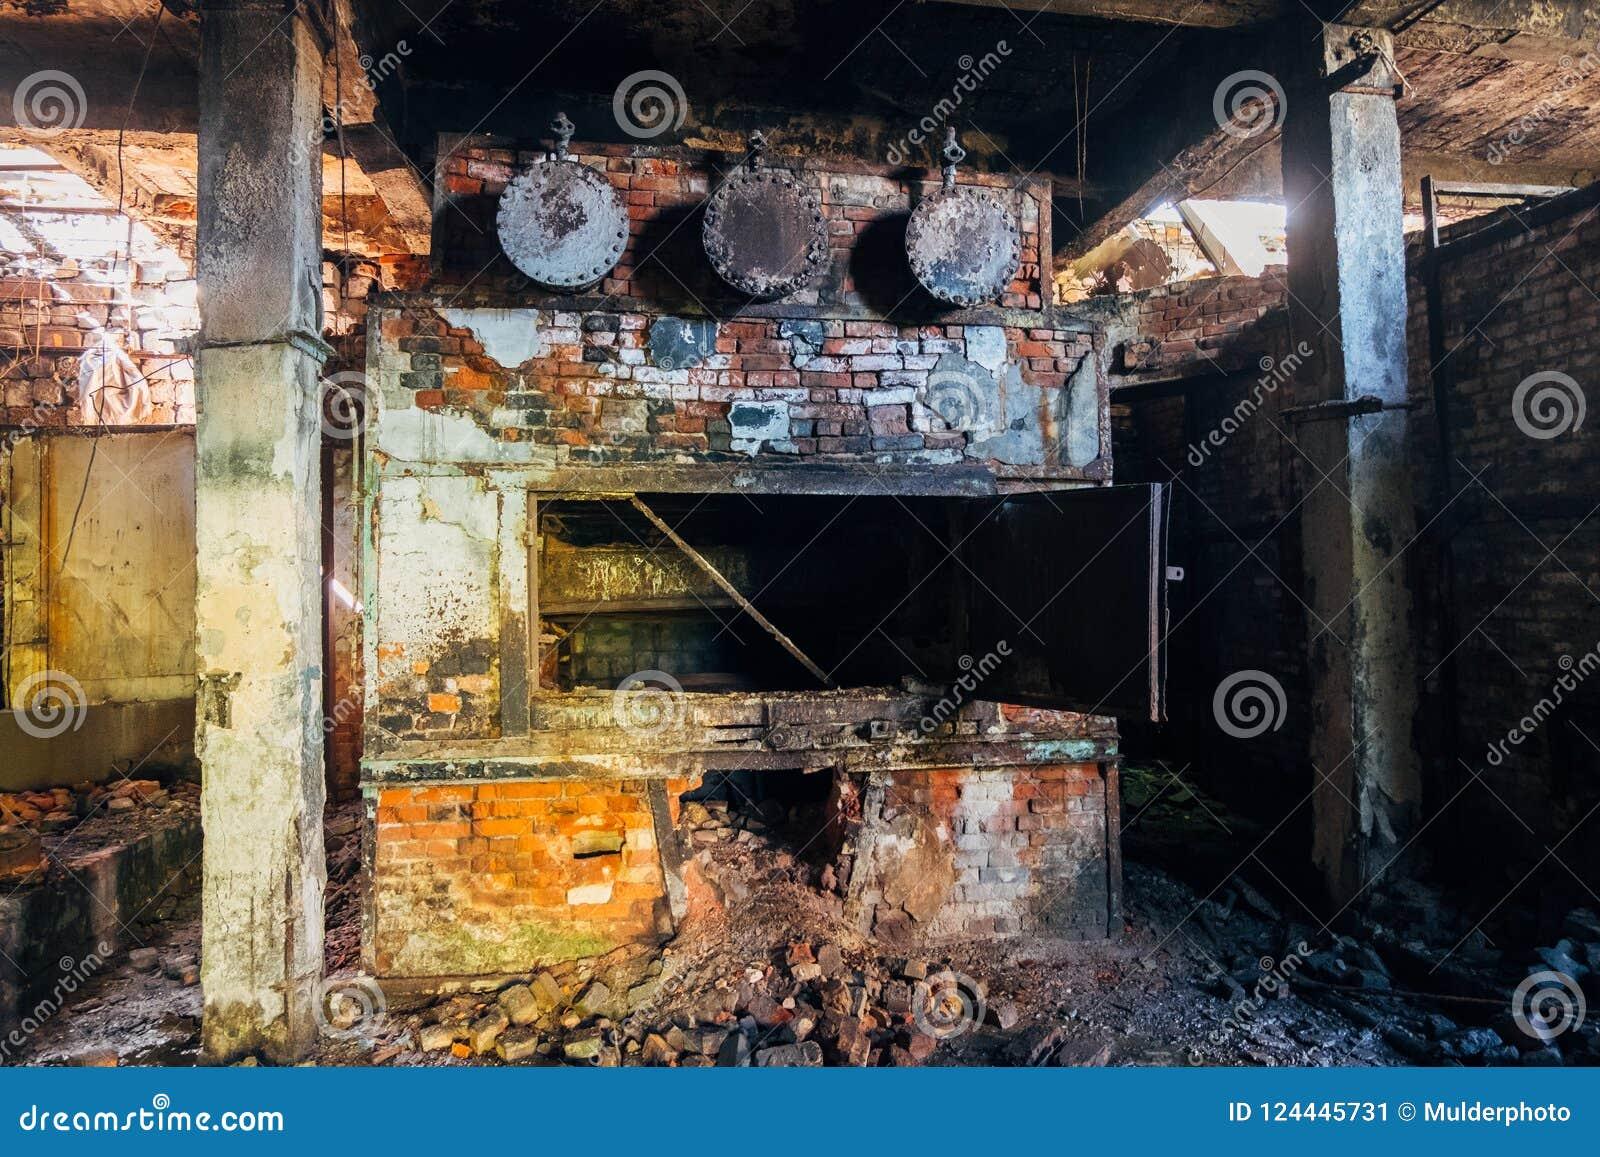 Boiler Room In The Basement Stock Photo Cartoondealer